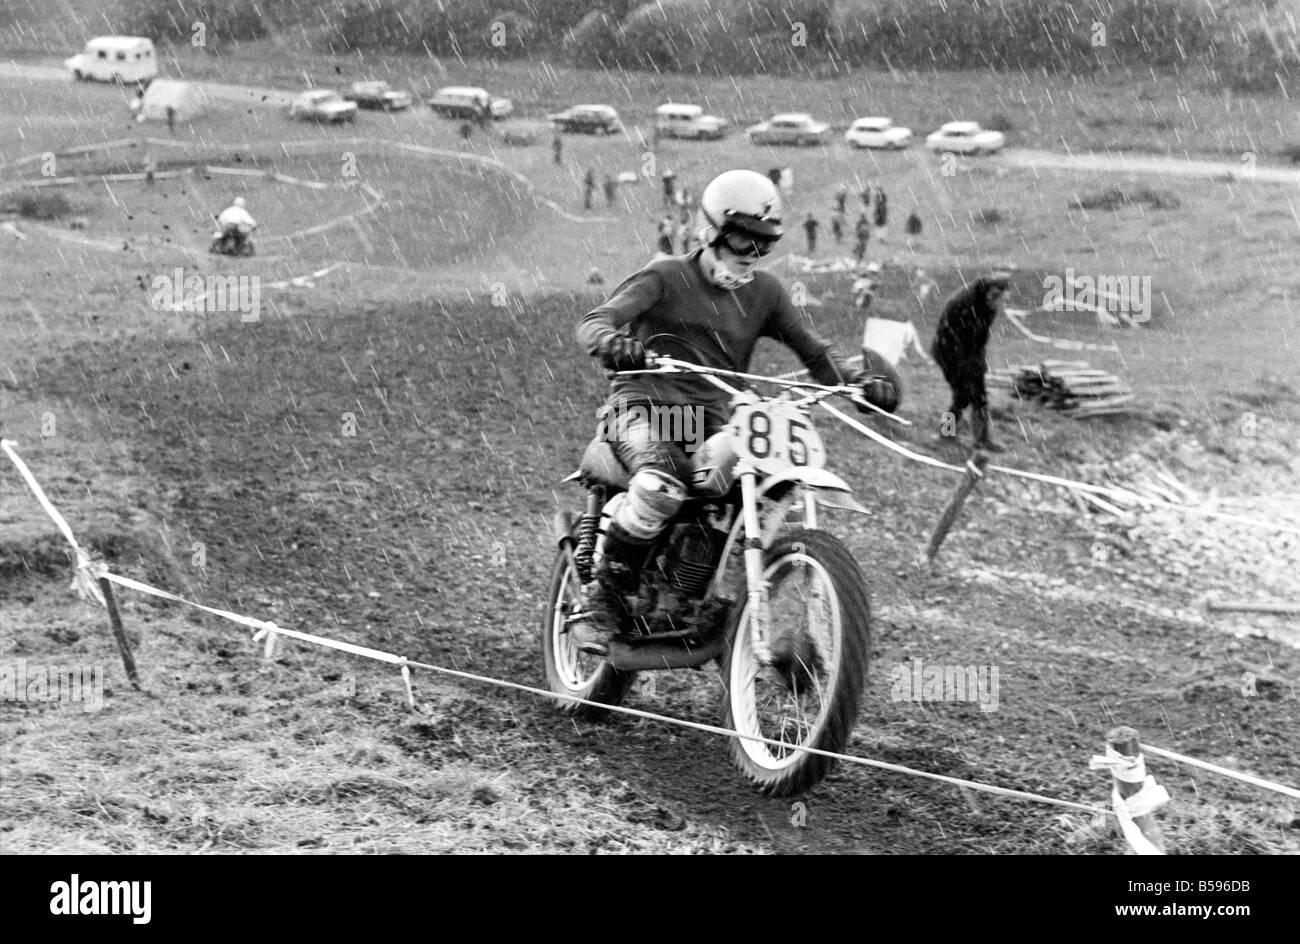 Motorsport/Children/Motorbike: Schoolboys Scramble. March 1975 75-01212-010 - Stock Image